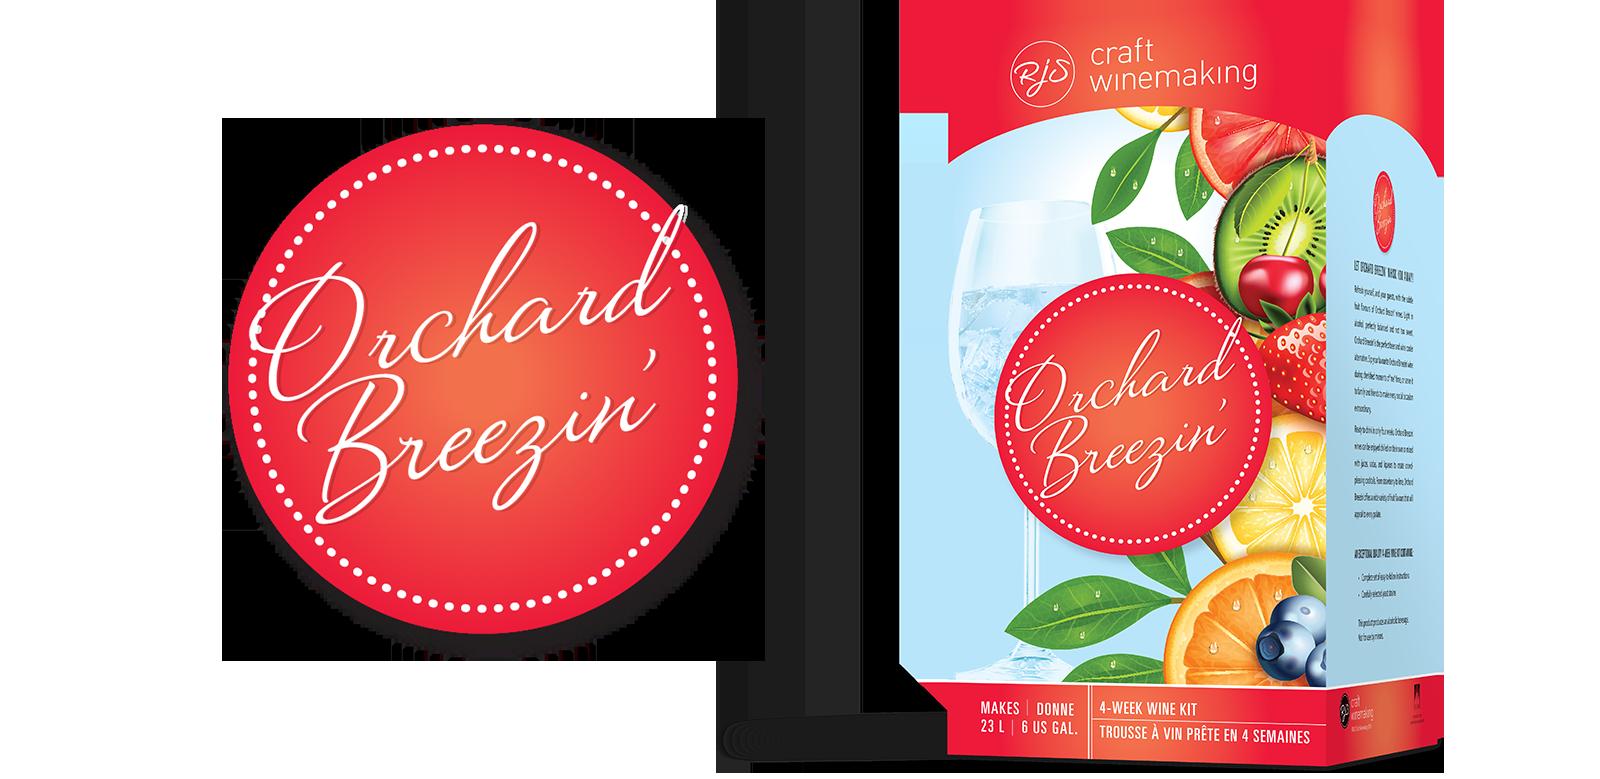 Orchard-Breezin.png